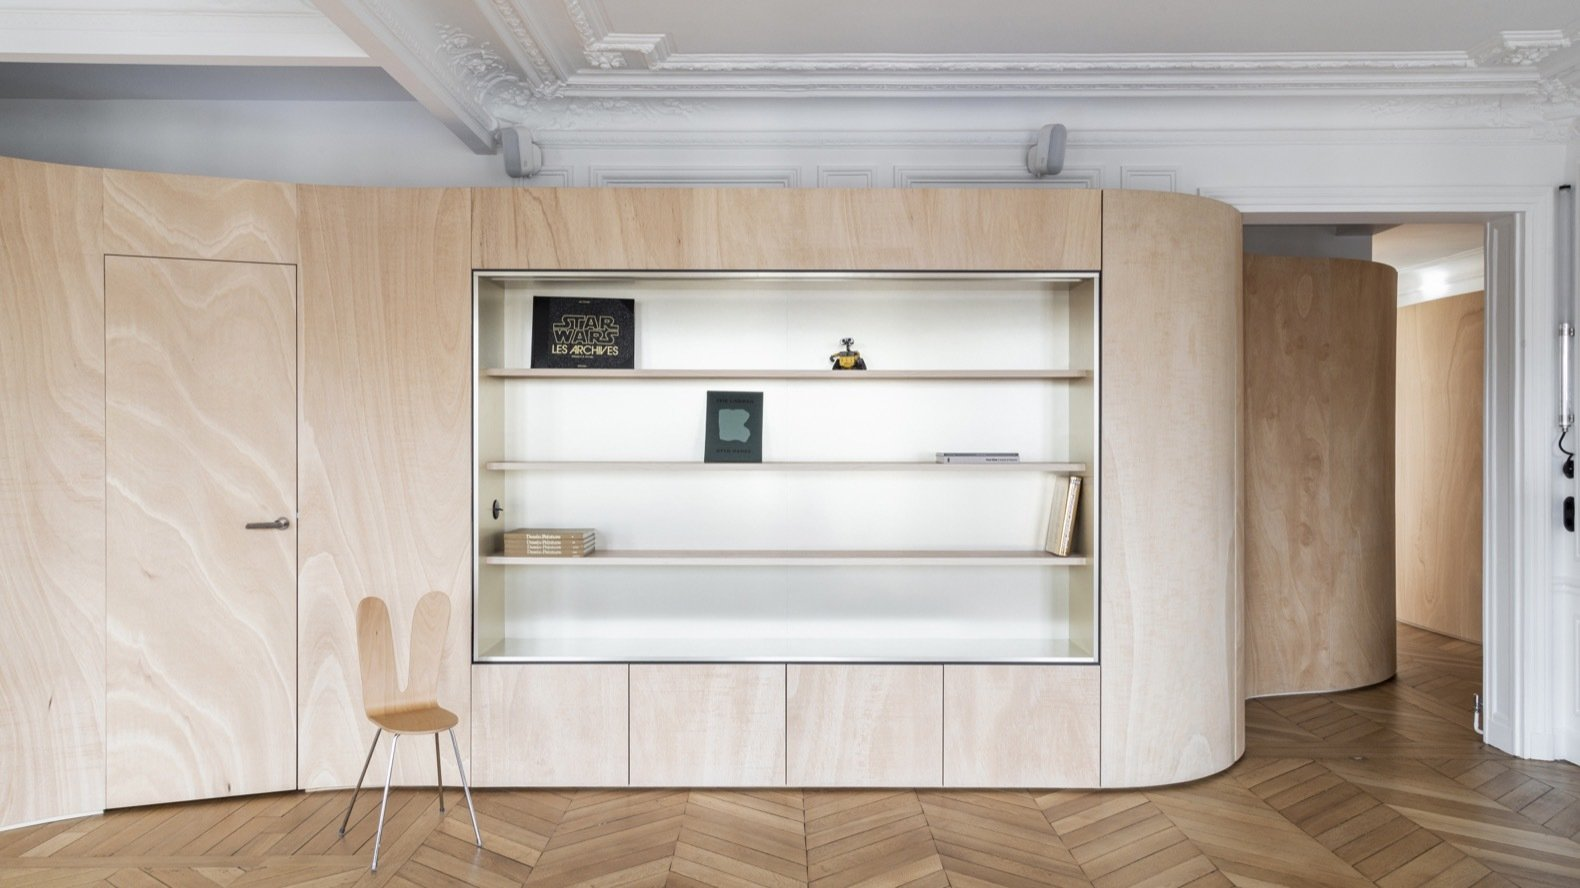 A Giant Ribbon of Wood Wraps This Mind-Bending Parisian Apartment